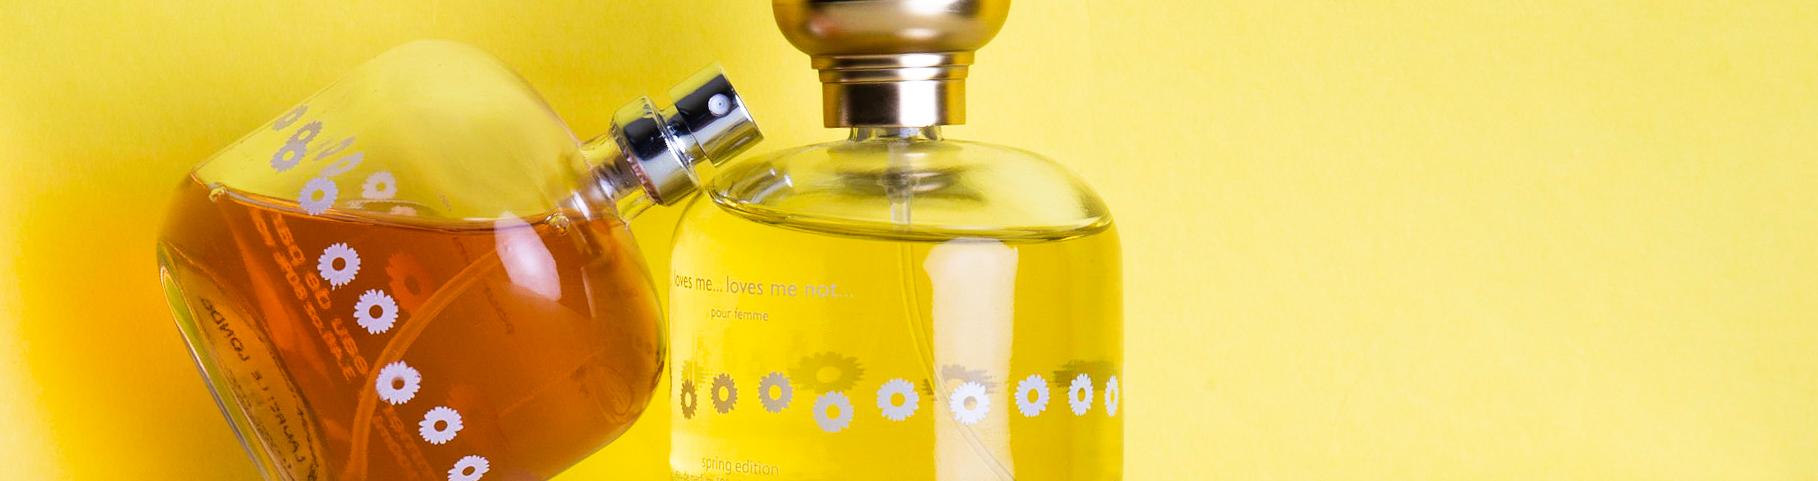 Perfume banner.JPG